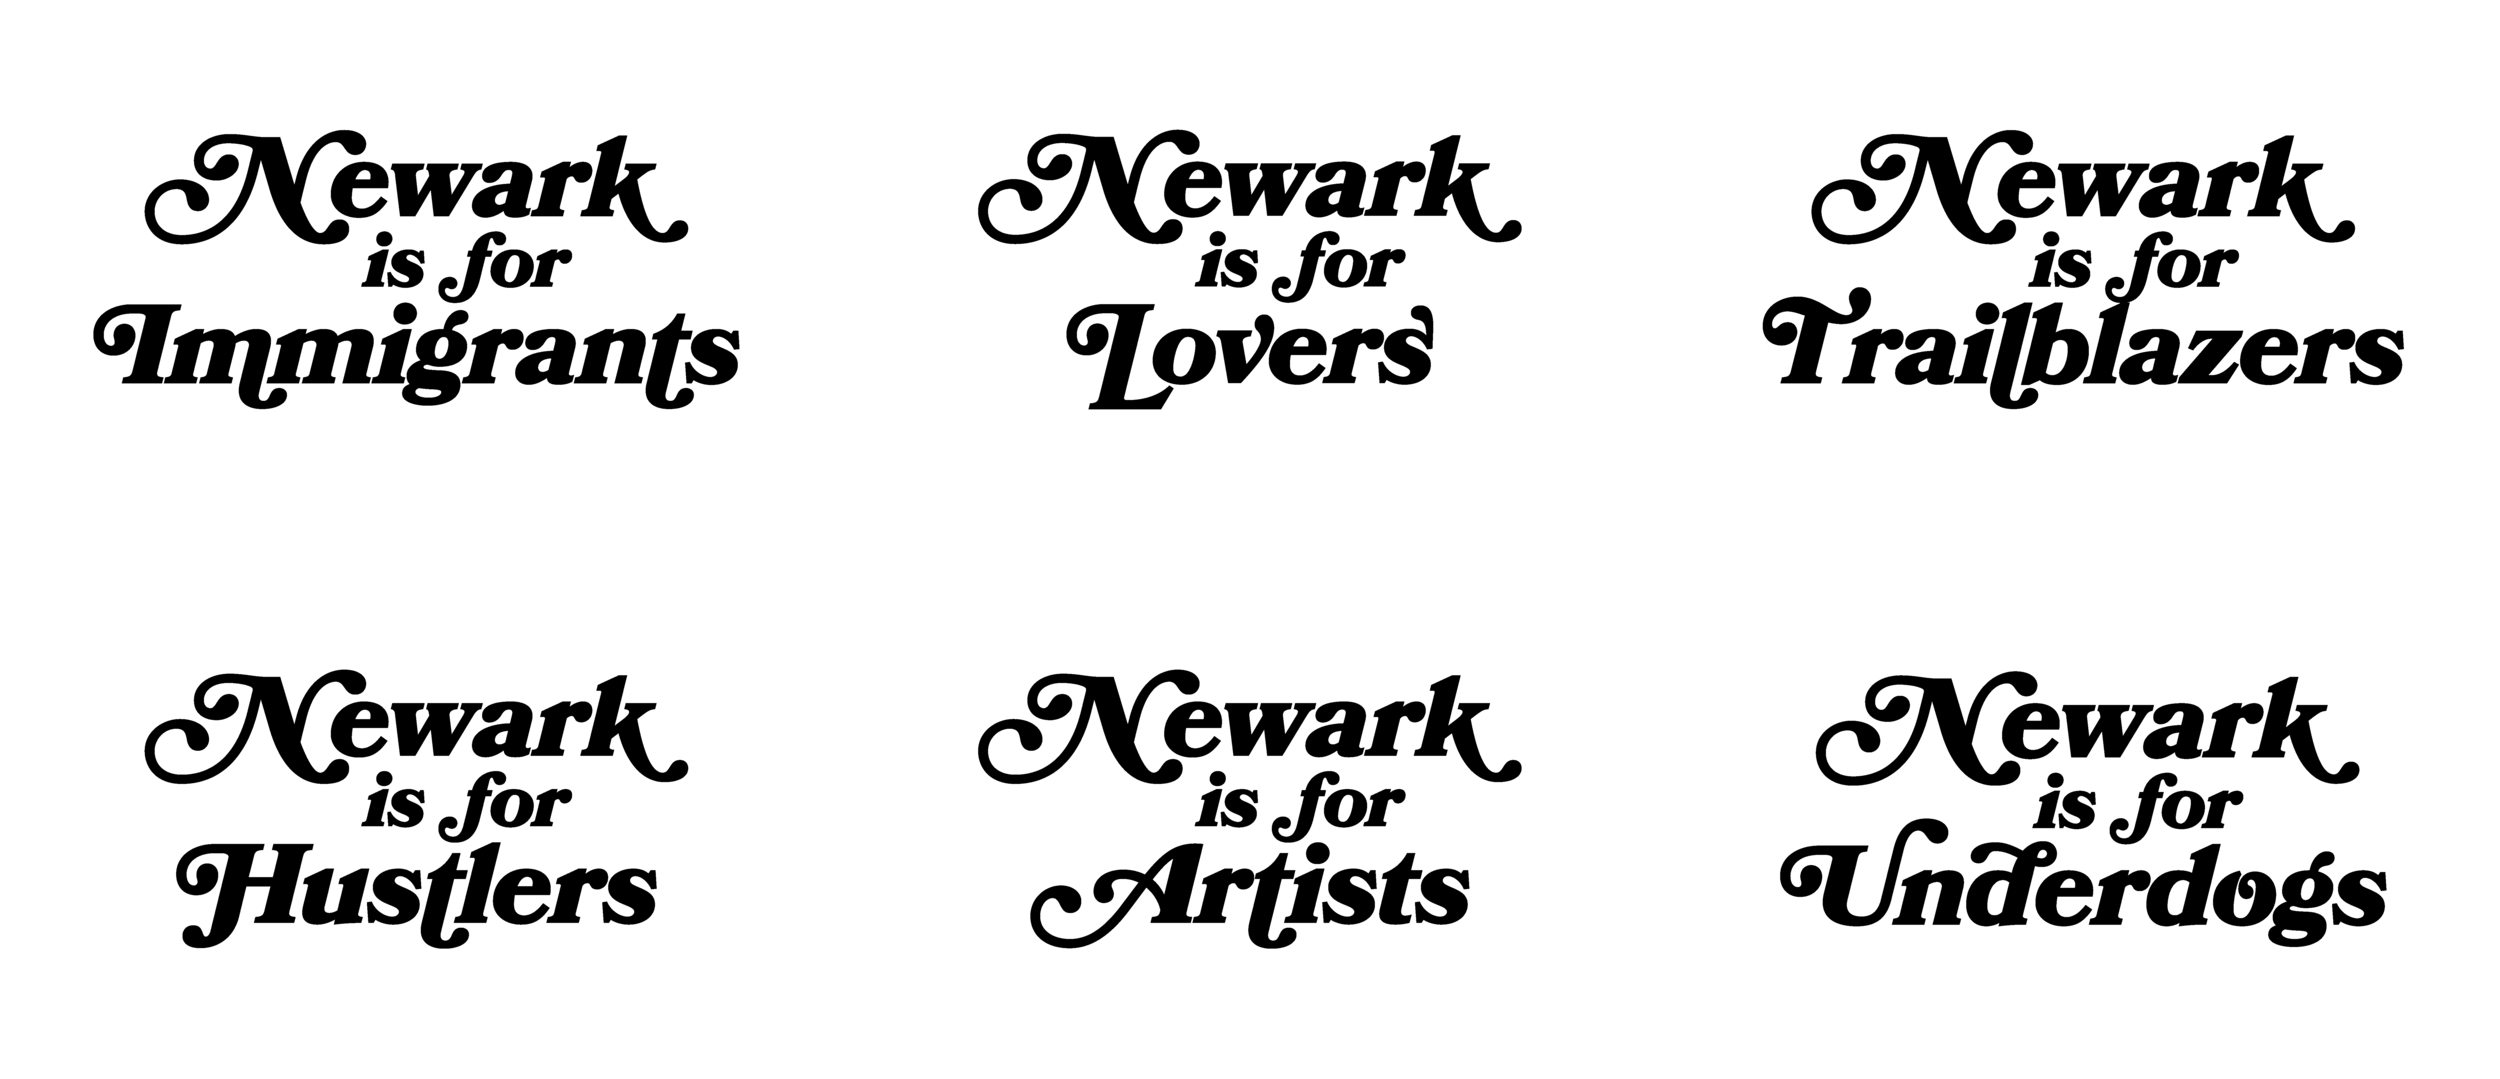 Newark is For Spread, NORK Project, Gabe Ribeiro, 2019.